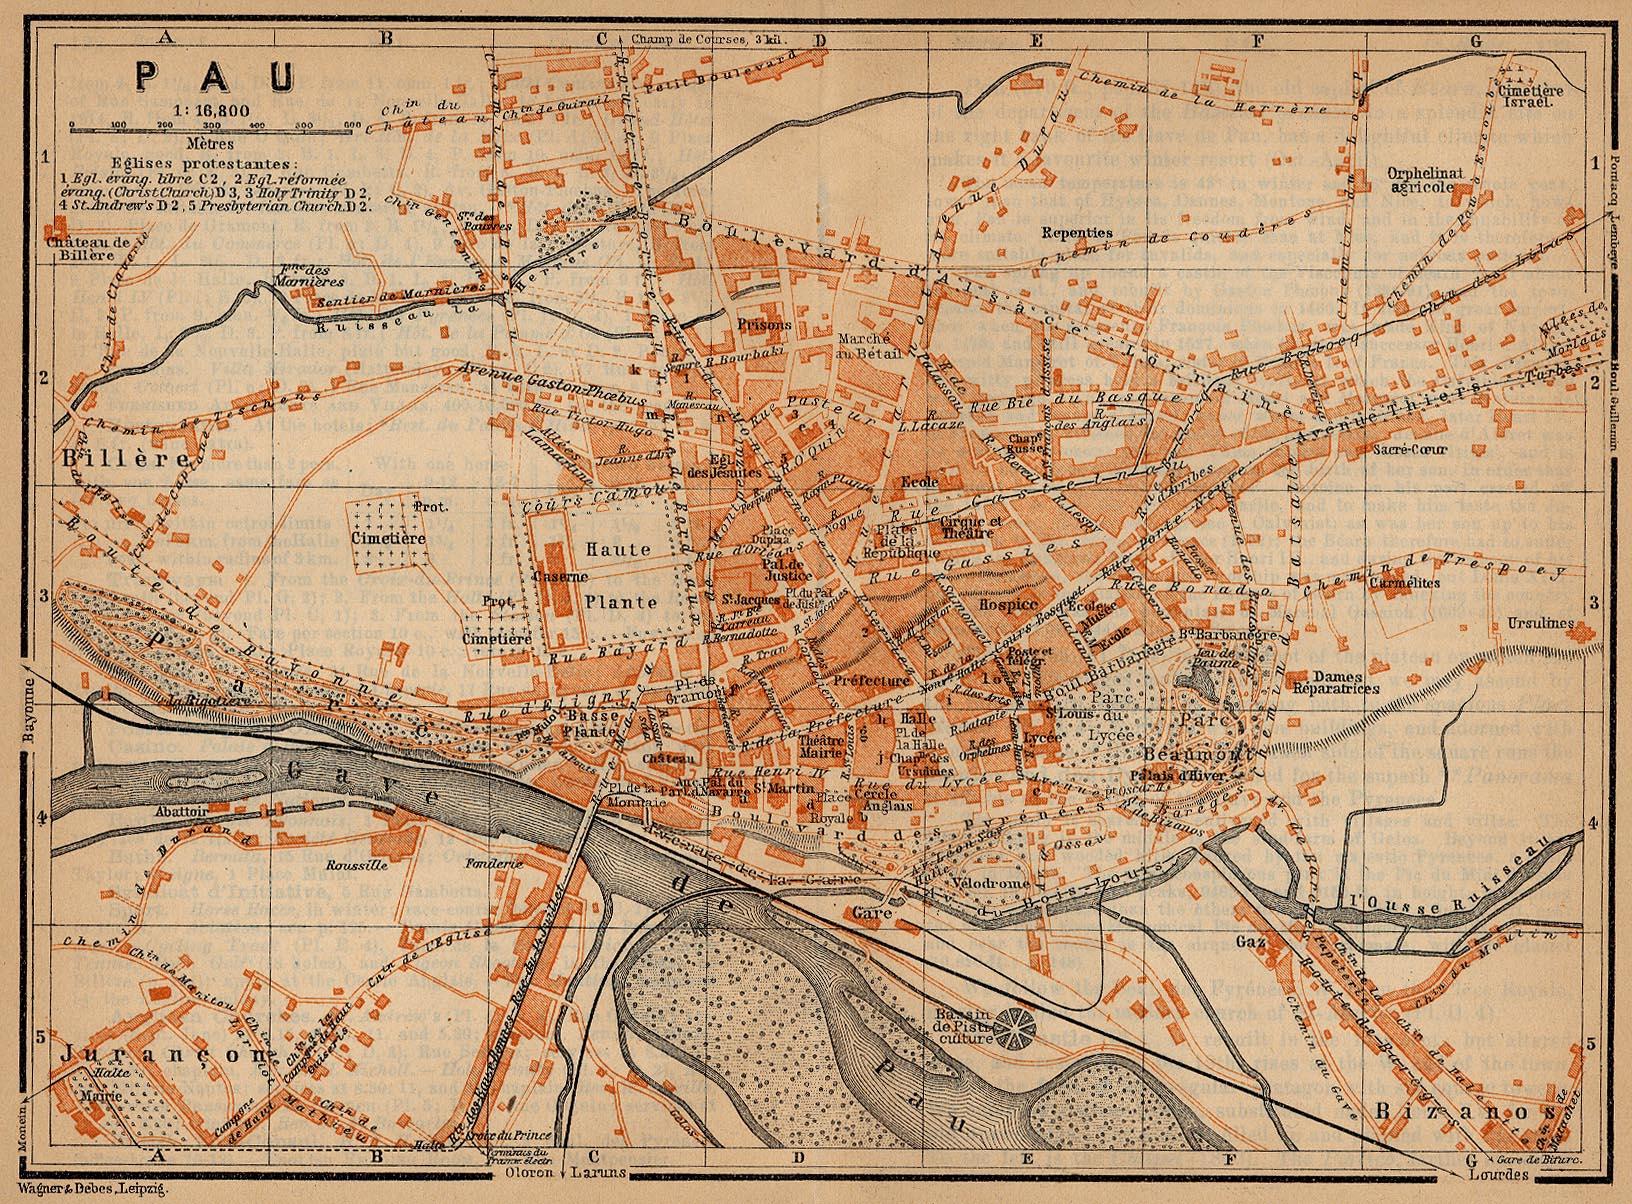 Pau Map, France 1914